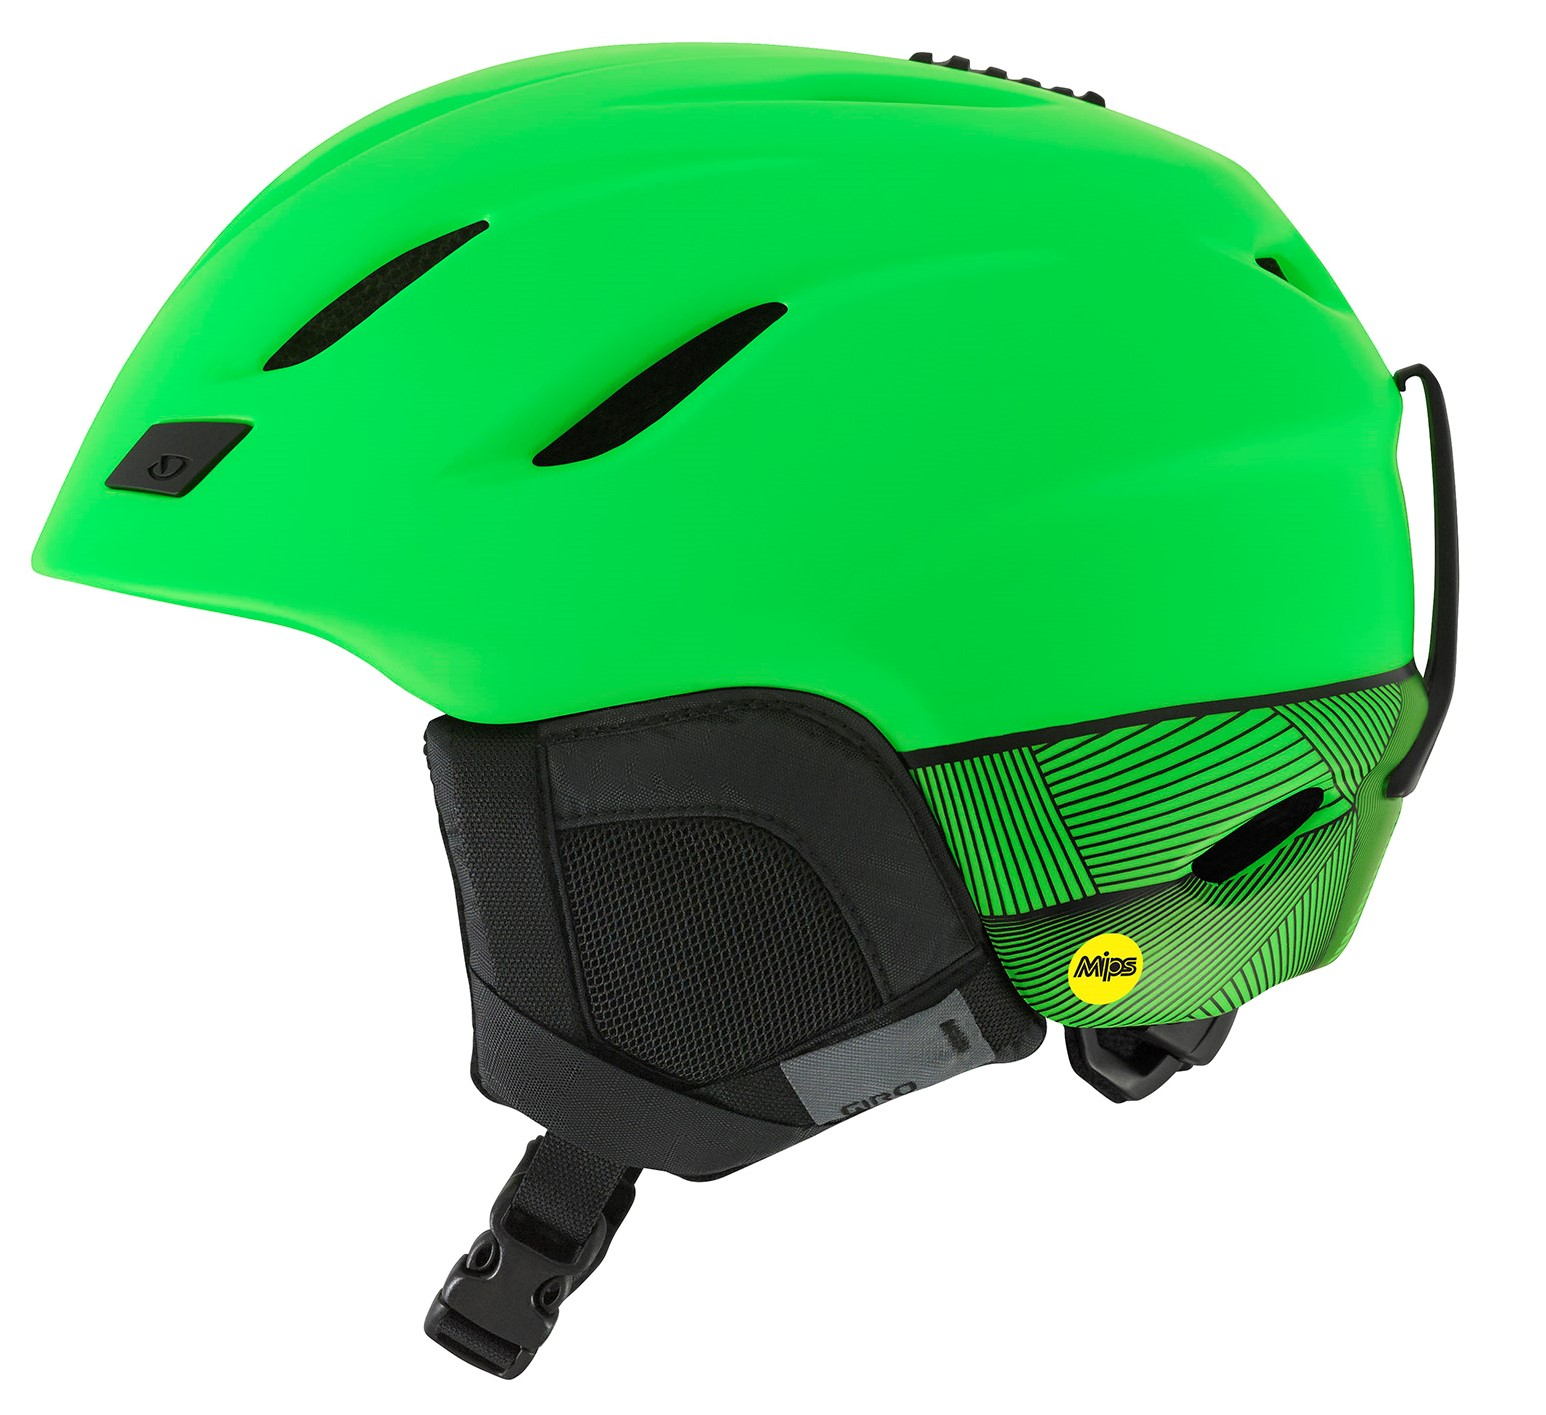 giro helmets 2019 - HD1546×1415